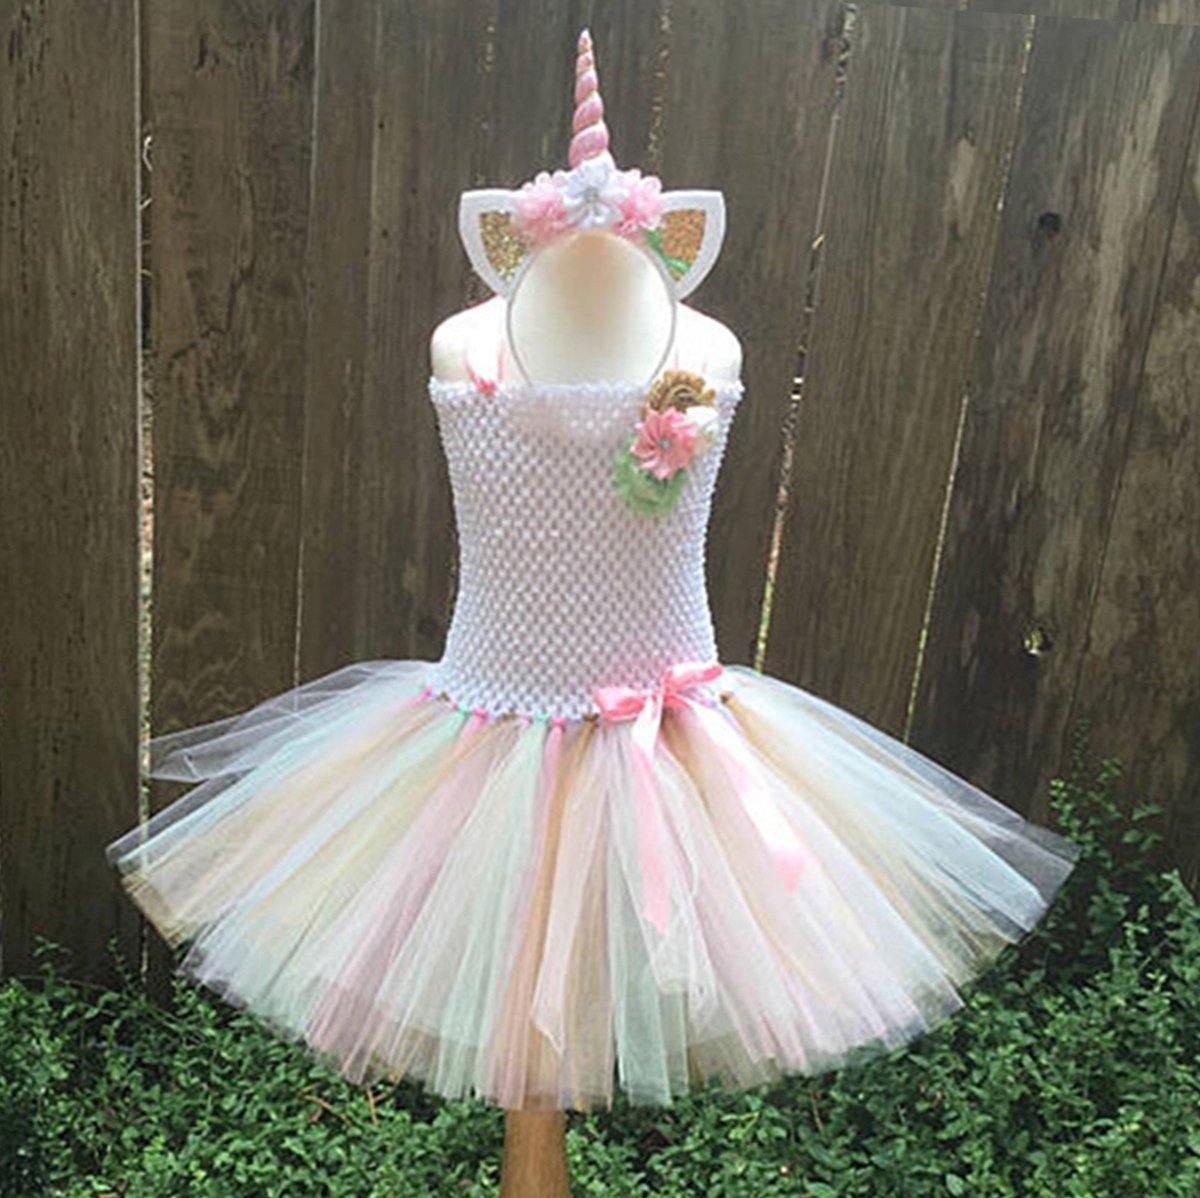 fa879a8f1e9d iiniim Kids Girls Ballet Tutu Tulle Dress Party Birthday Costume Set ...